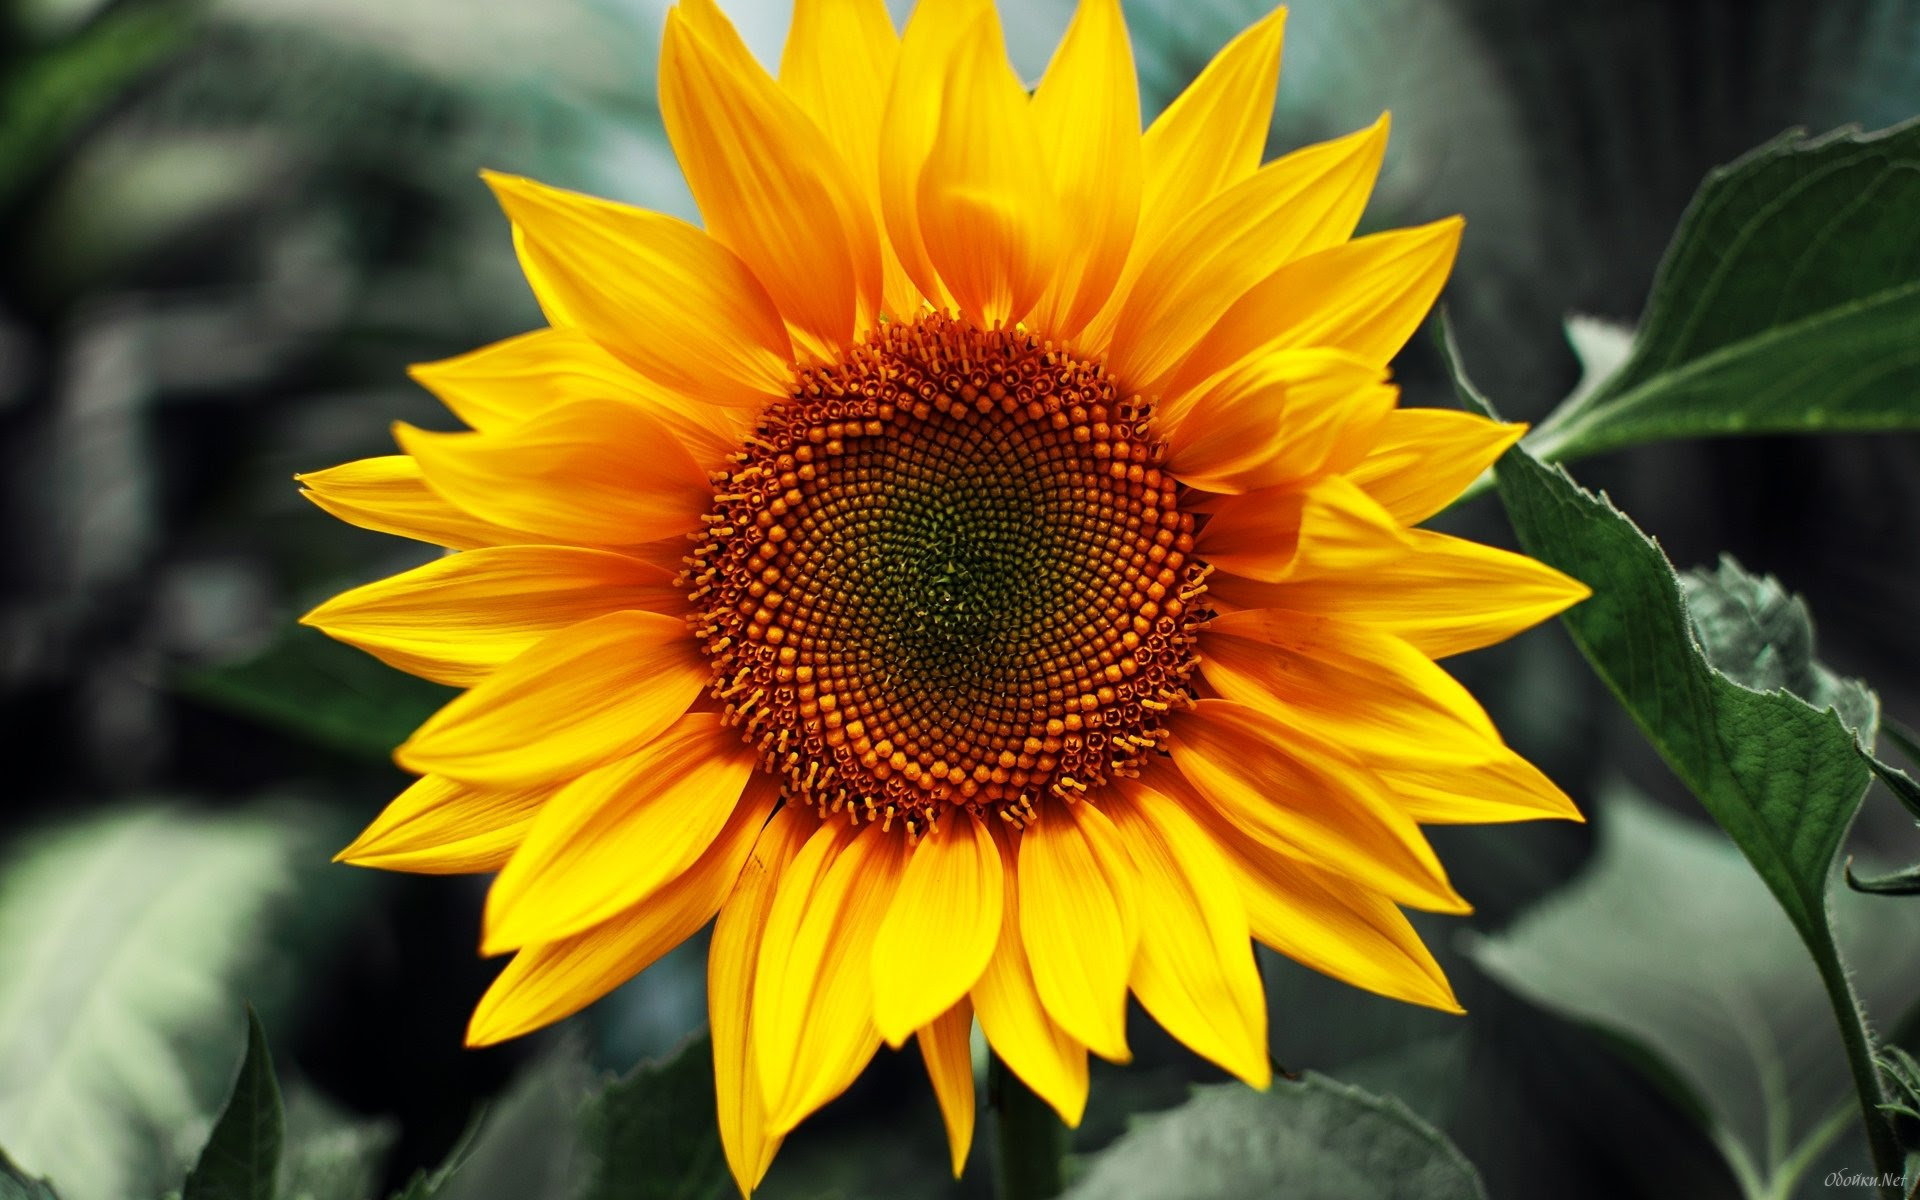 HD Sunflower Wallpaper - WallpaperSafari